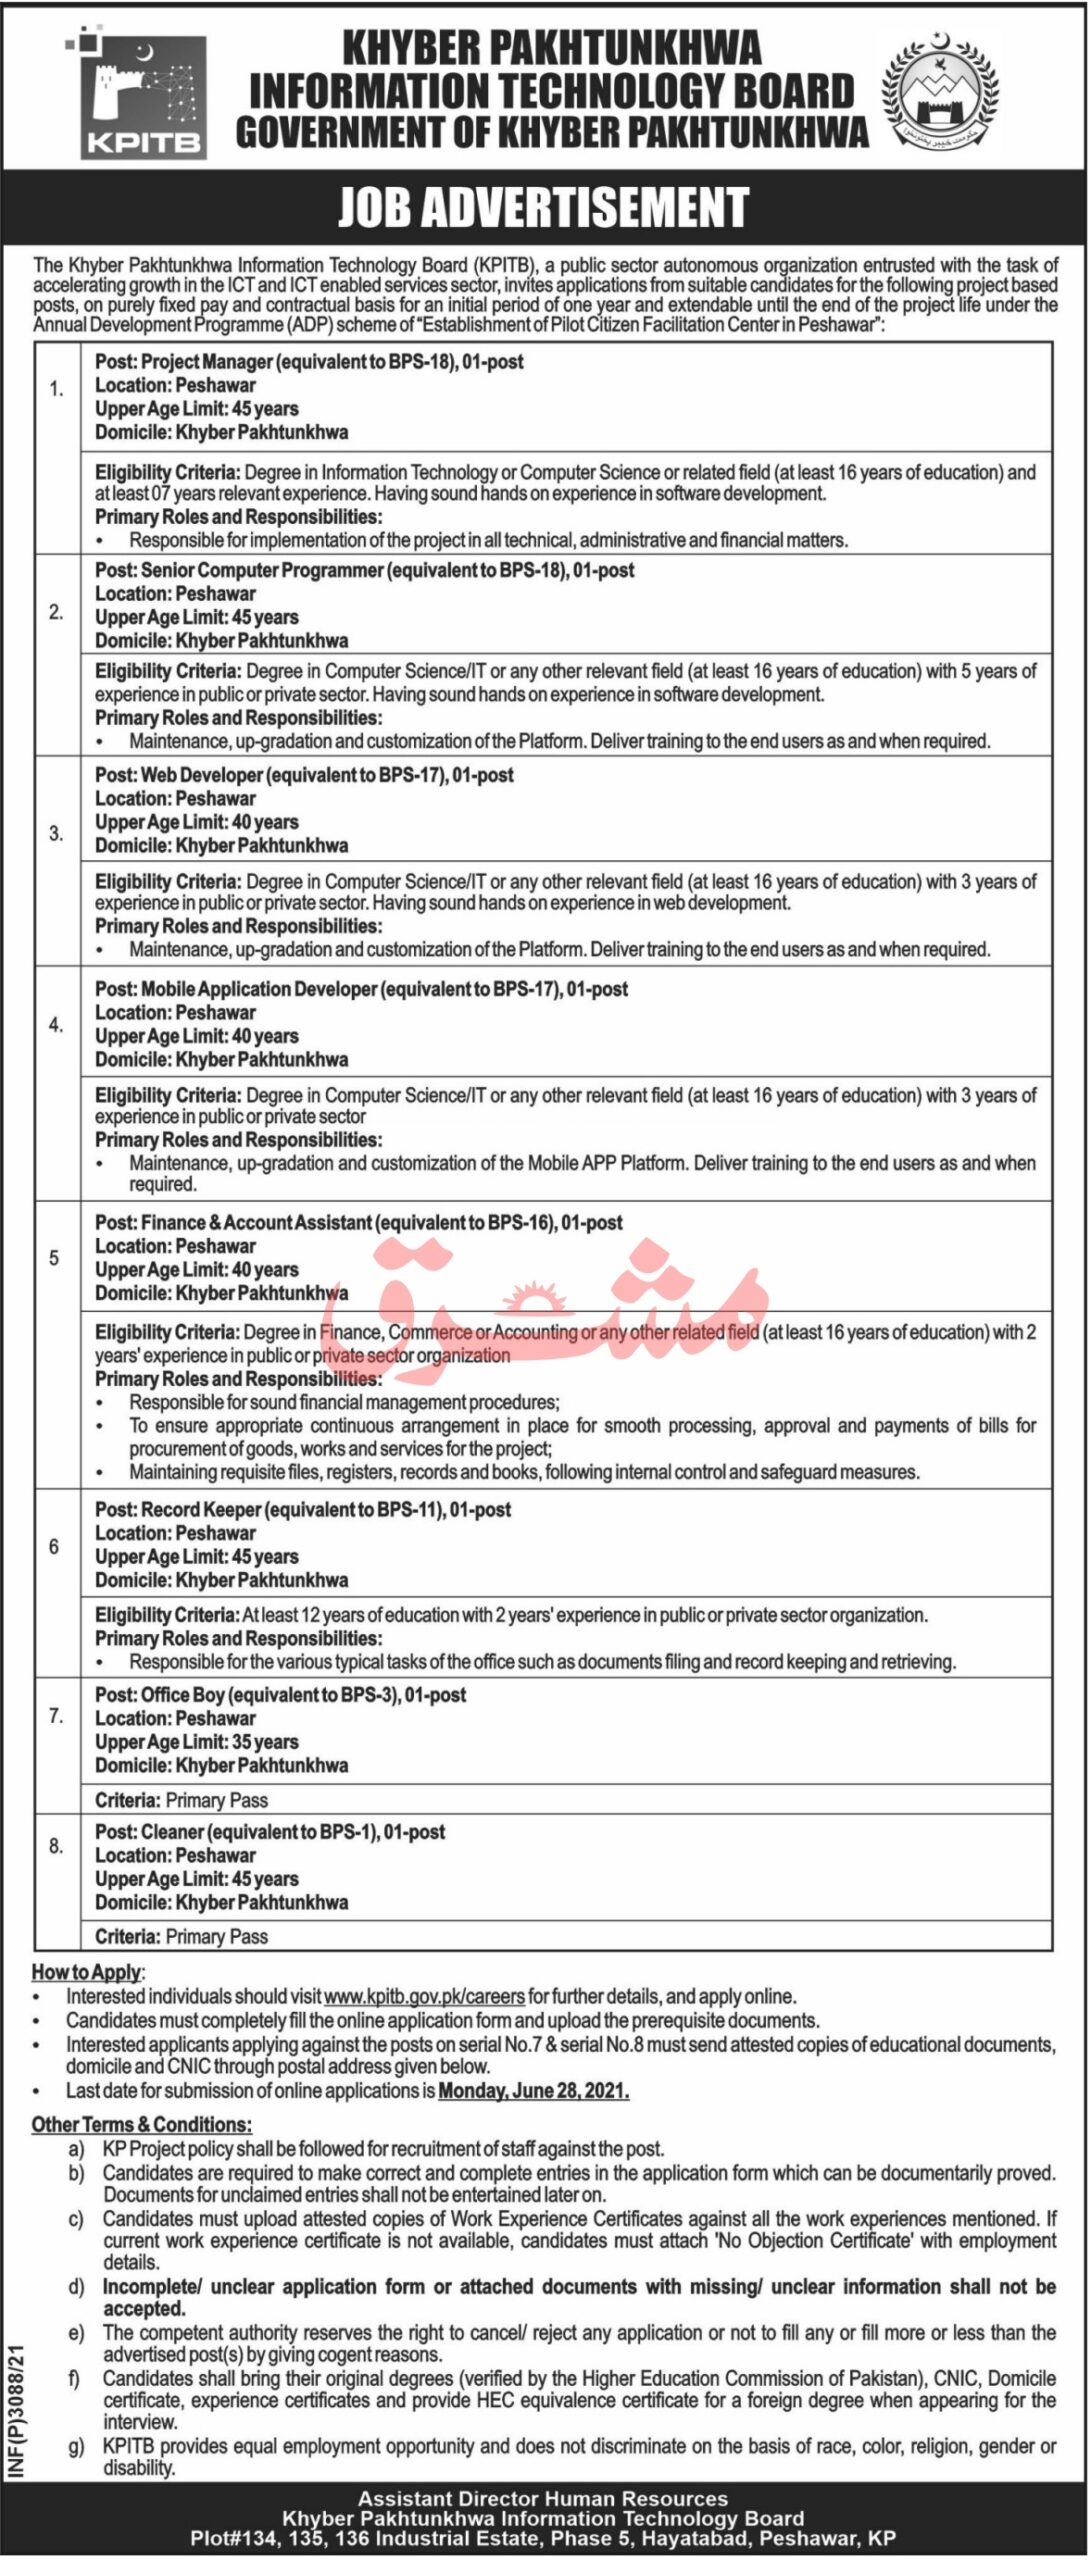 Khyber Pakhtunkhwa Information Technology Board KPITB Jobs June 2021